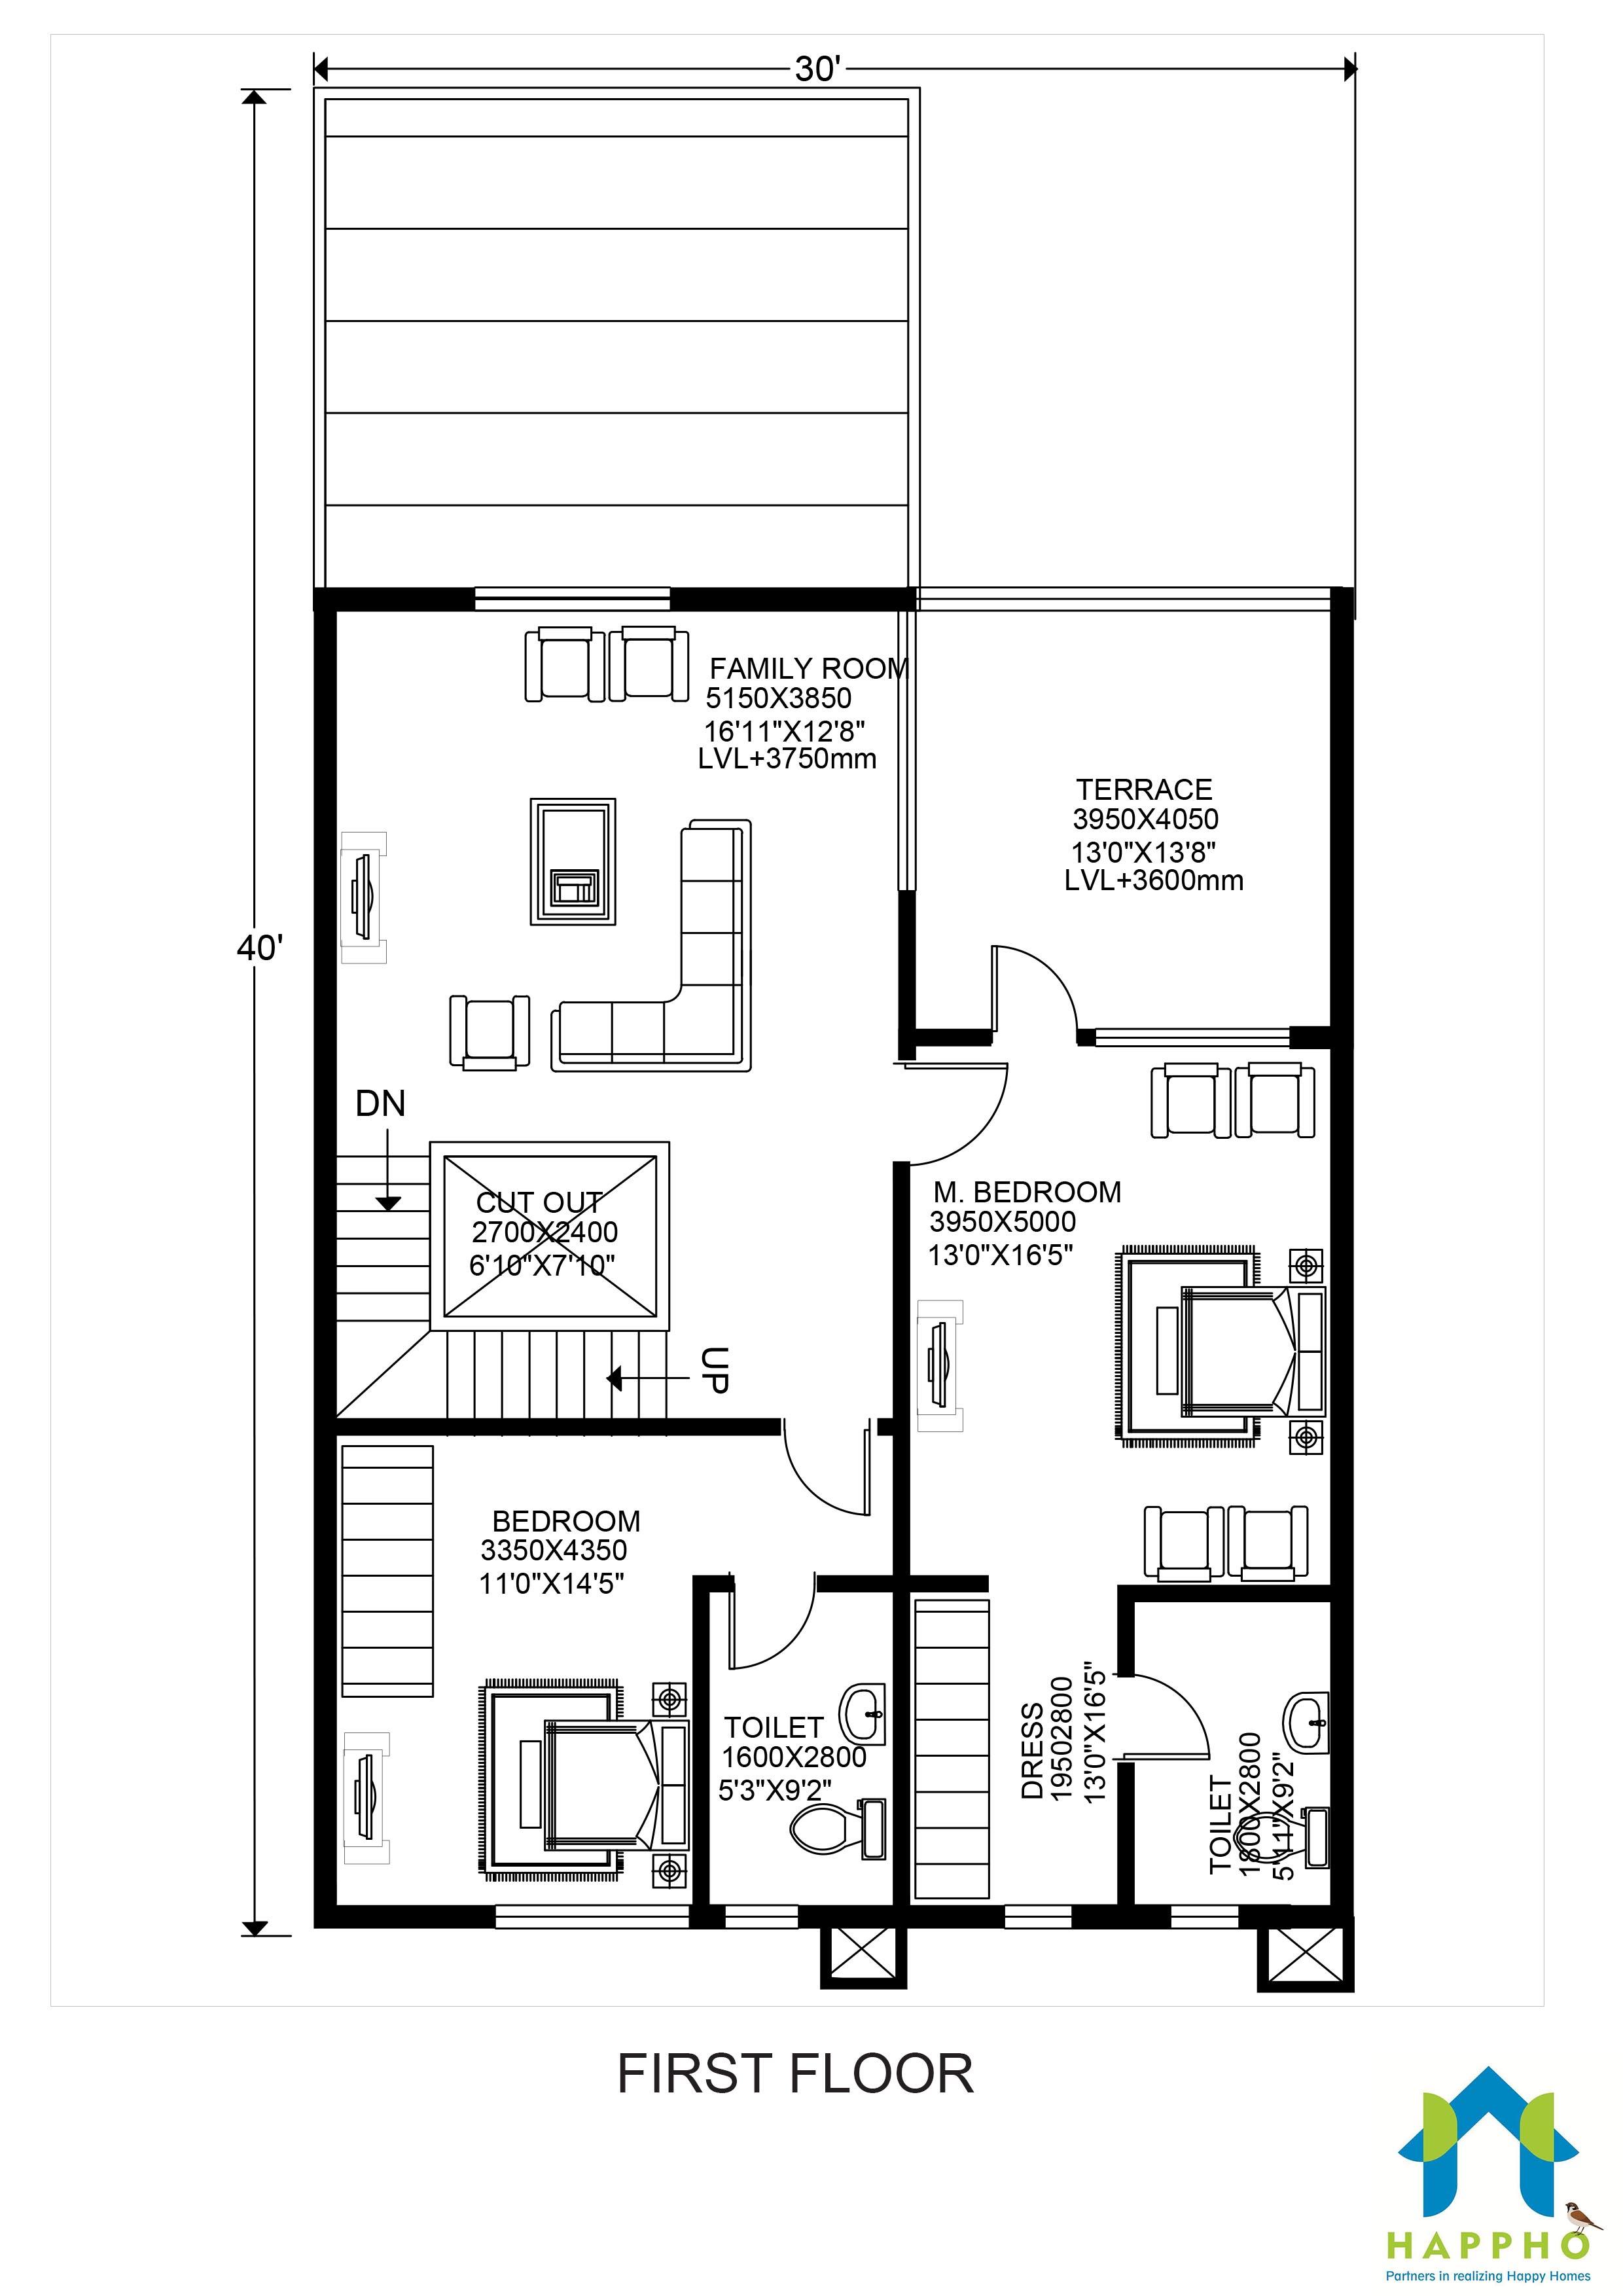 Floor Plan for 30 X 40 Feet Plot | 3-BHK (1200 Square Feet